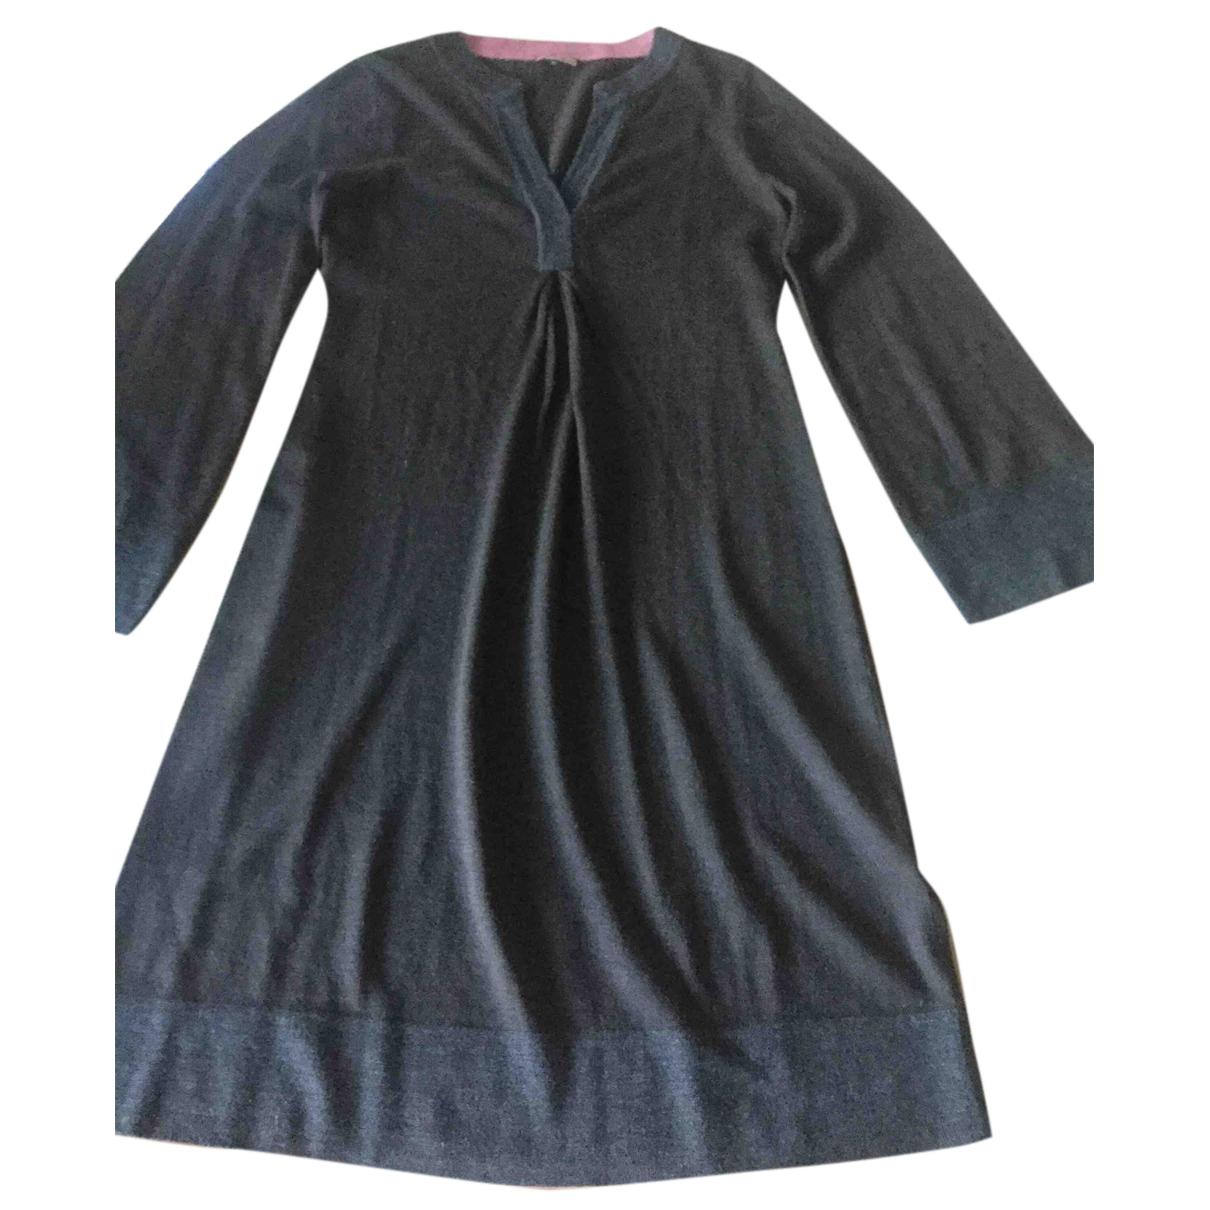 Maliparmi \N Kleid in  Bunt Wolle